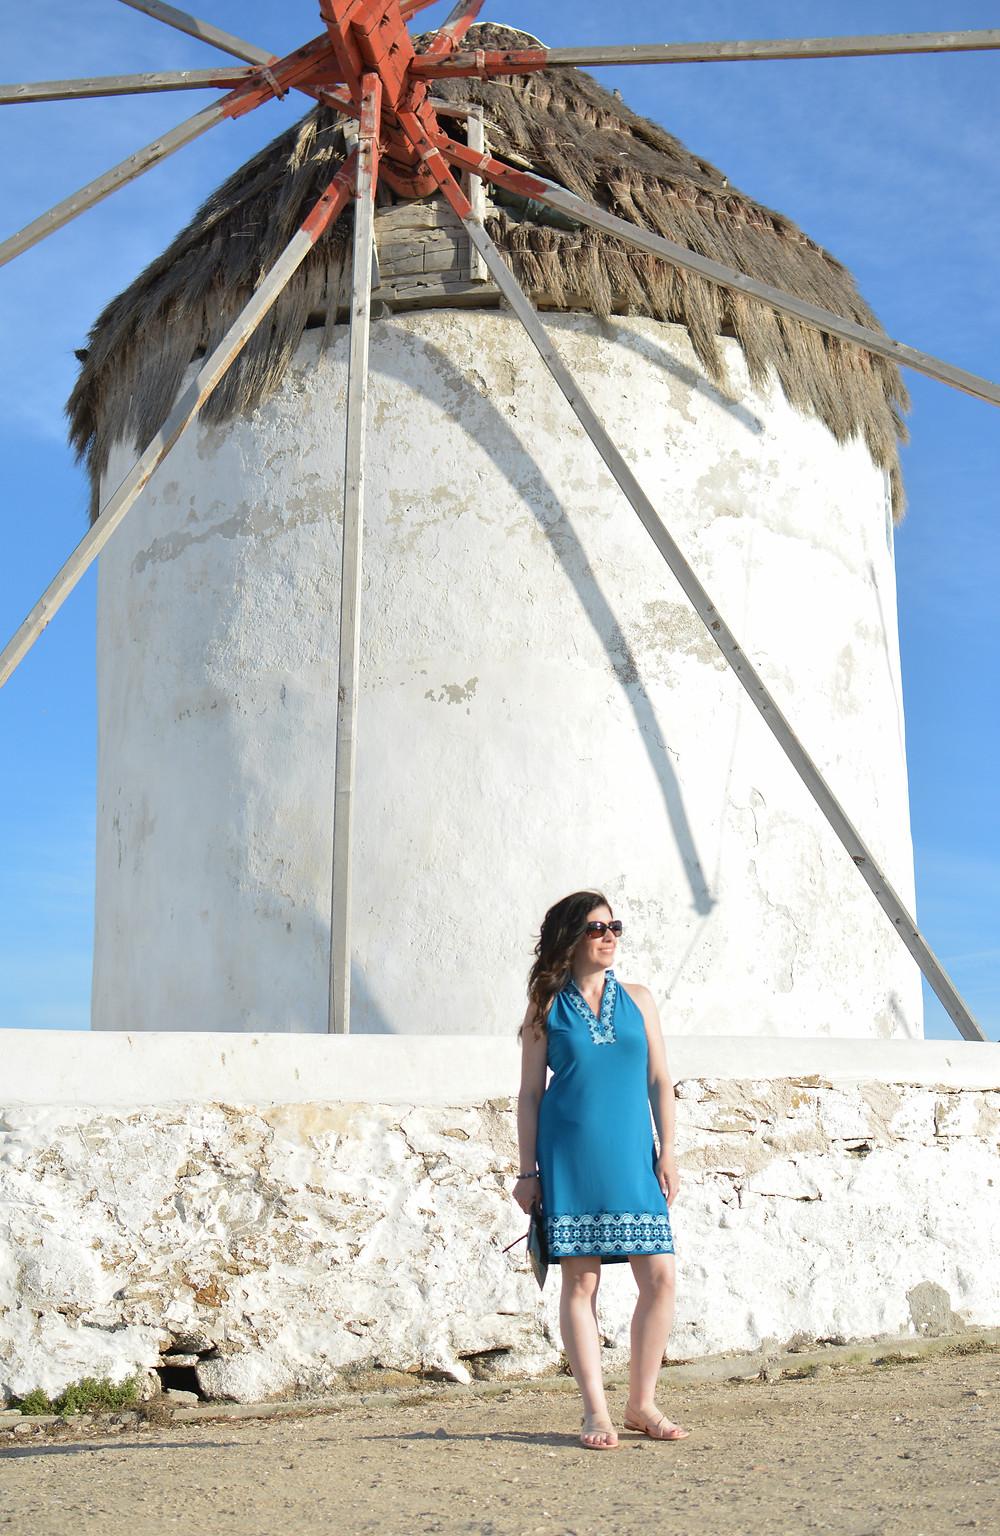 Windmills on Mykonos island, Greece